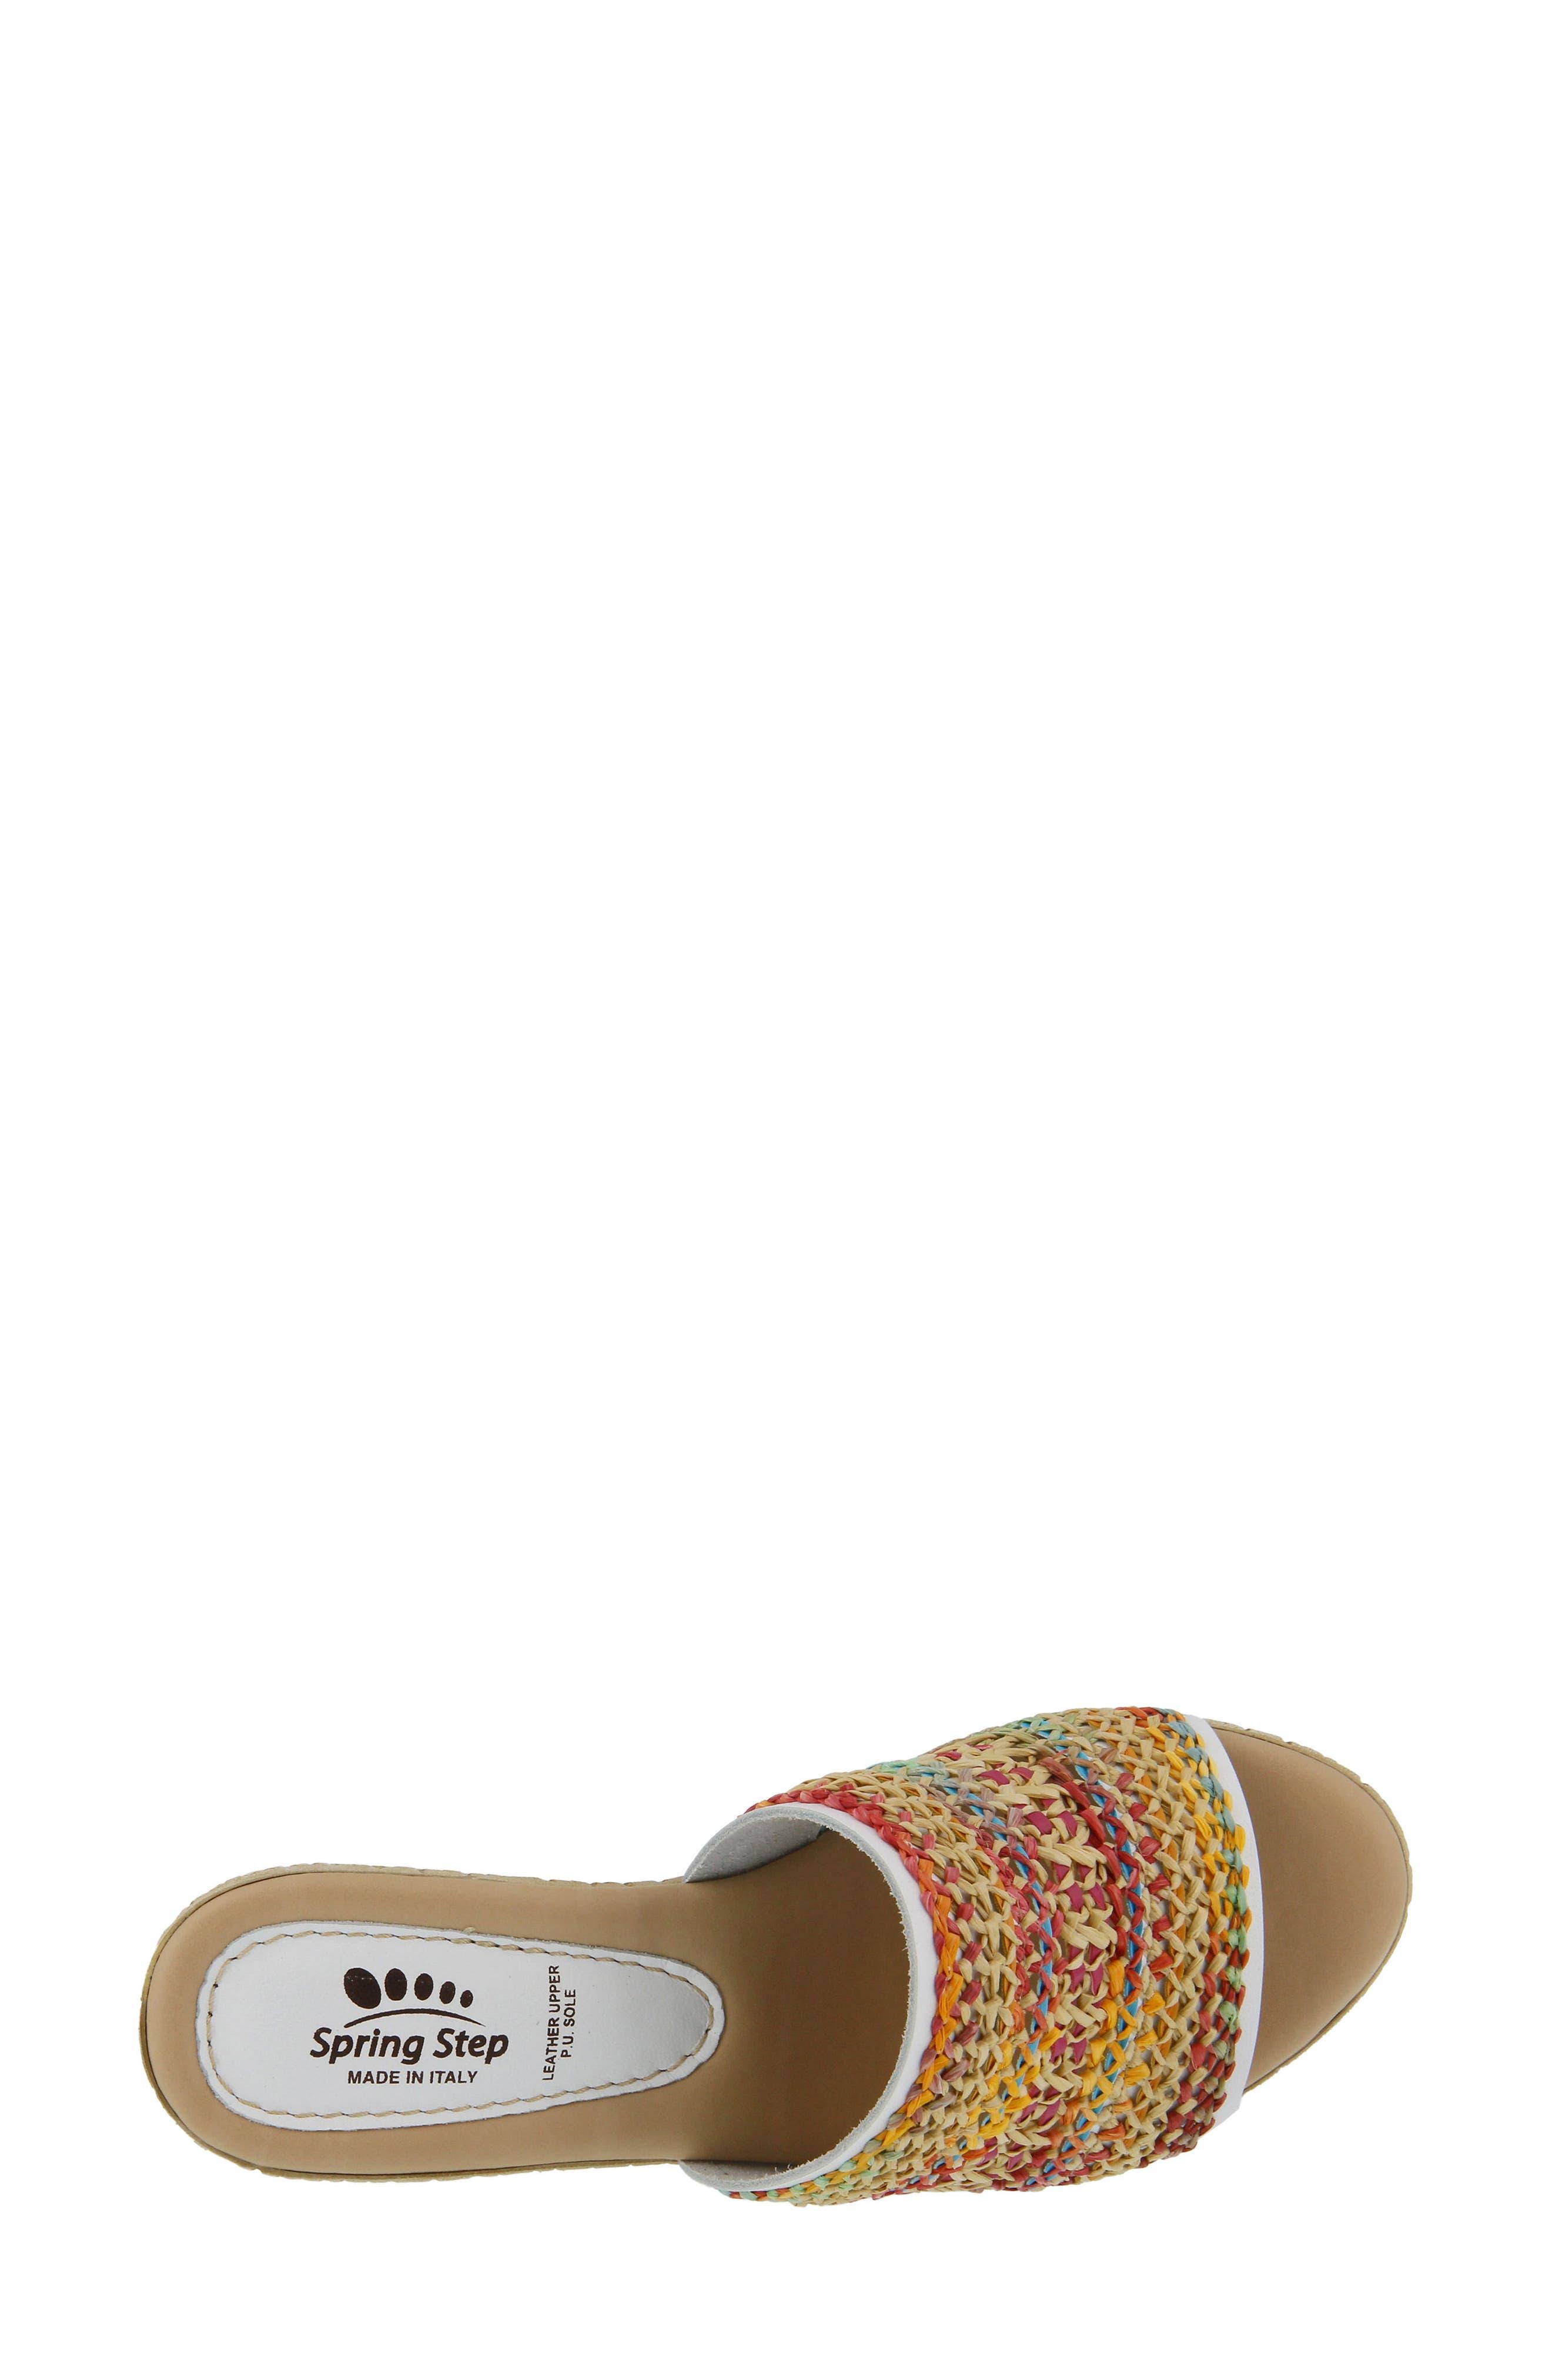 Calci Espadrille Wedge Sandal,                             Alternate thumbnail 4, color,                             White Leather